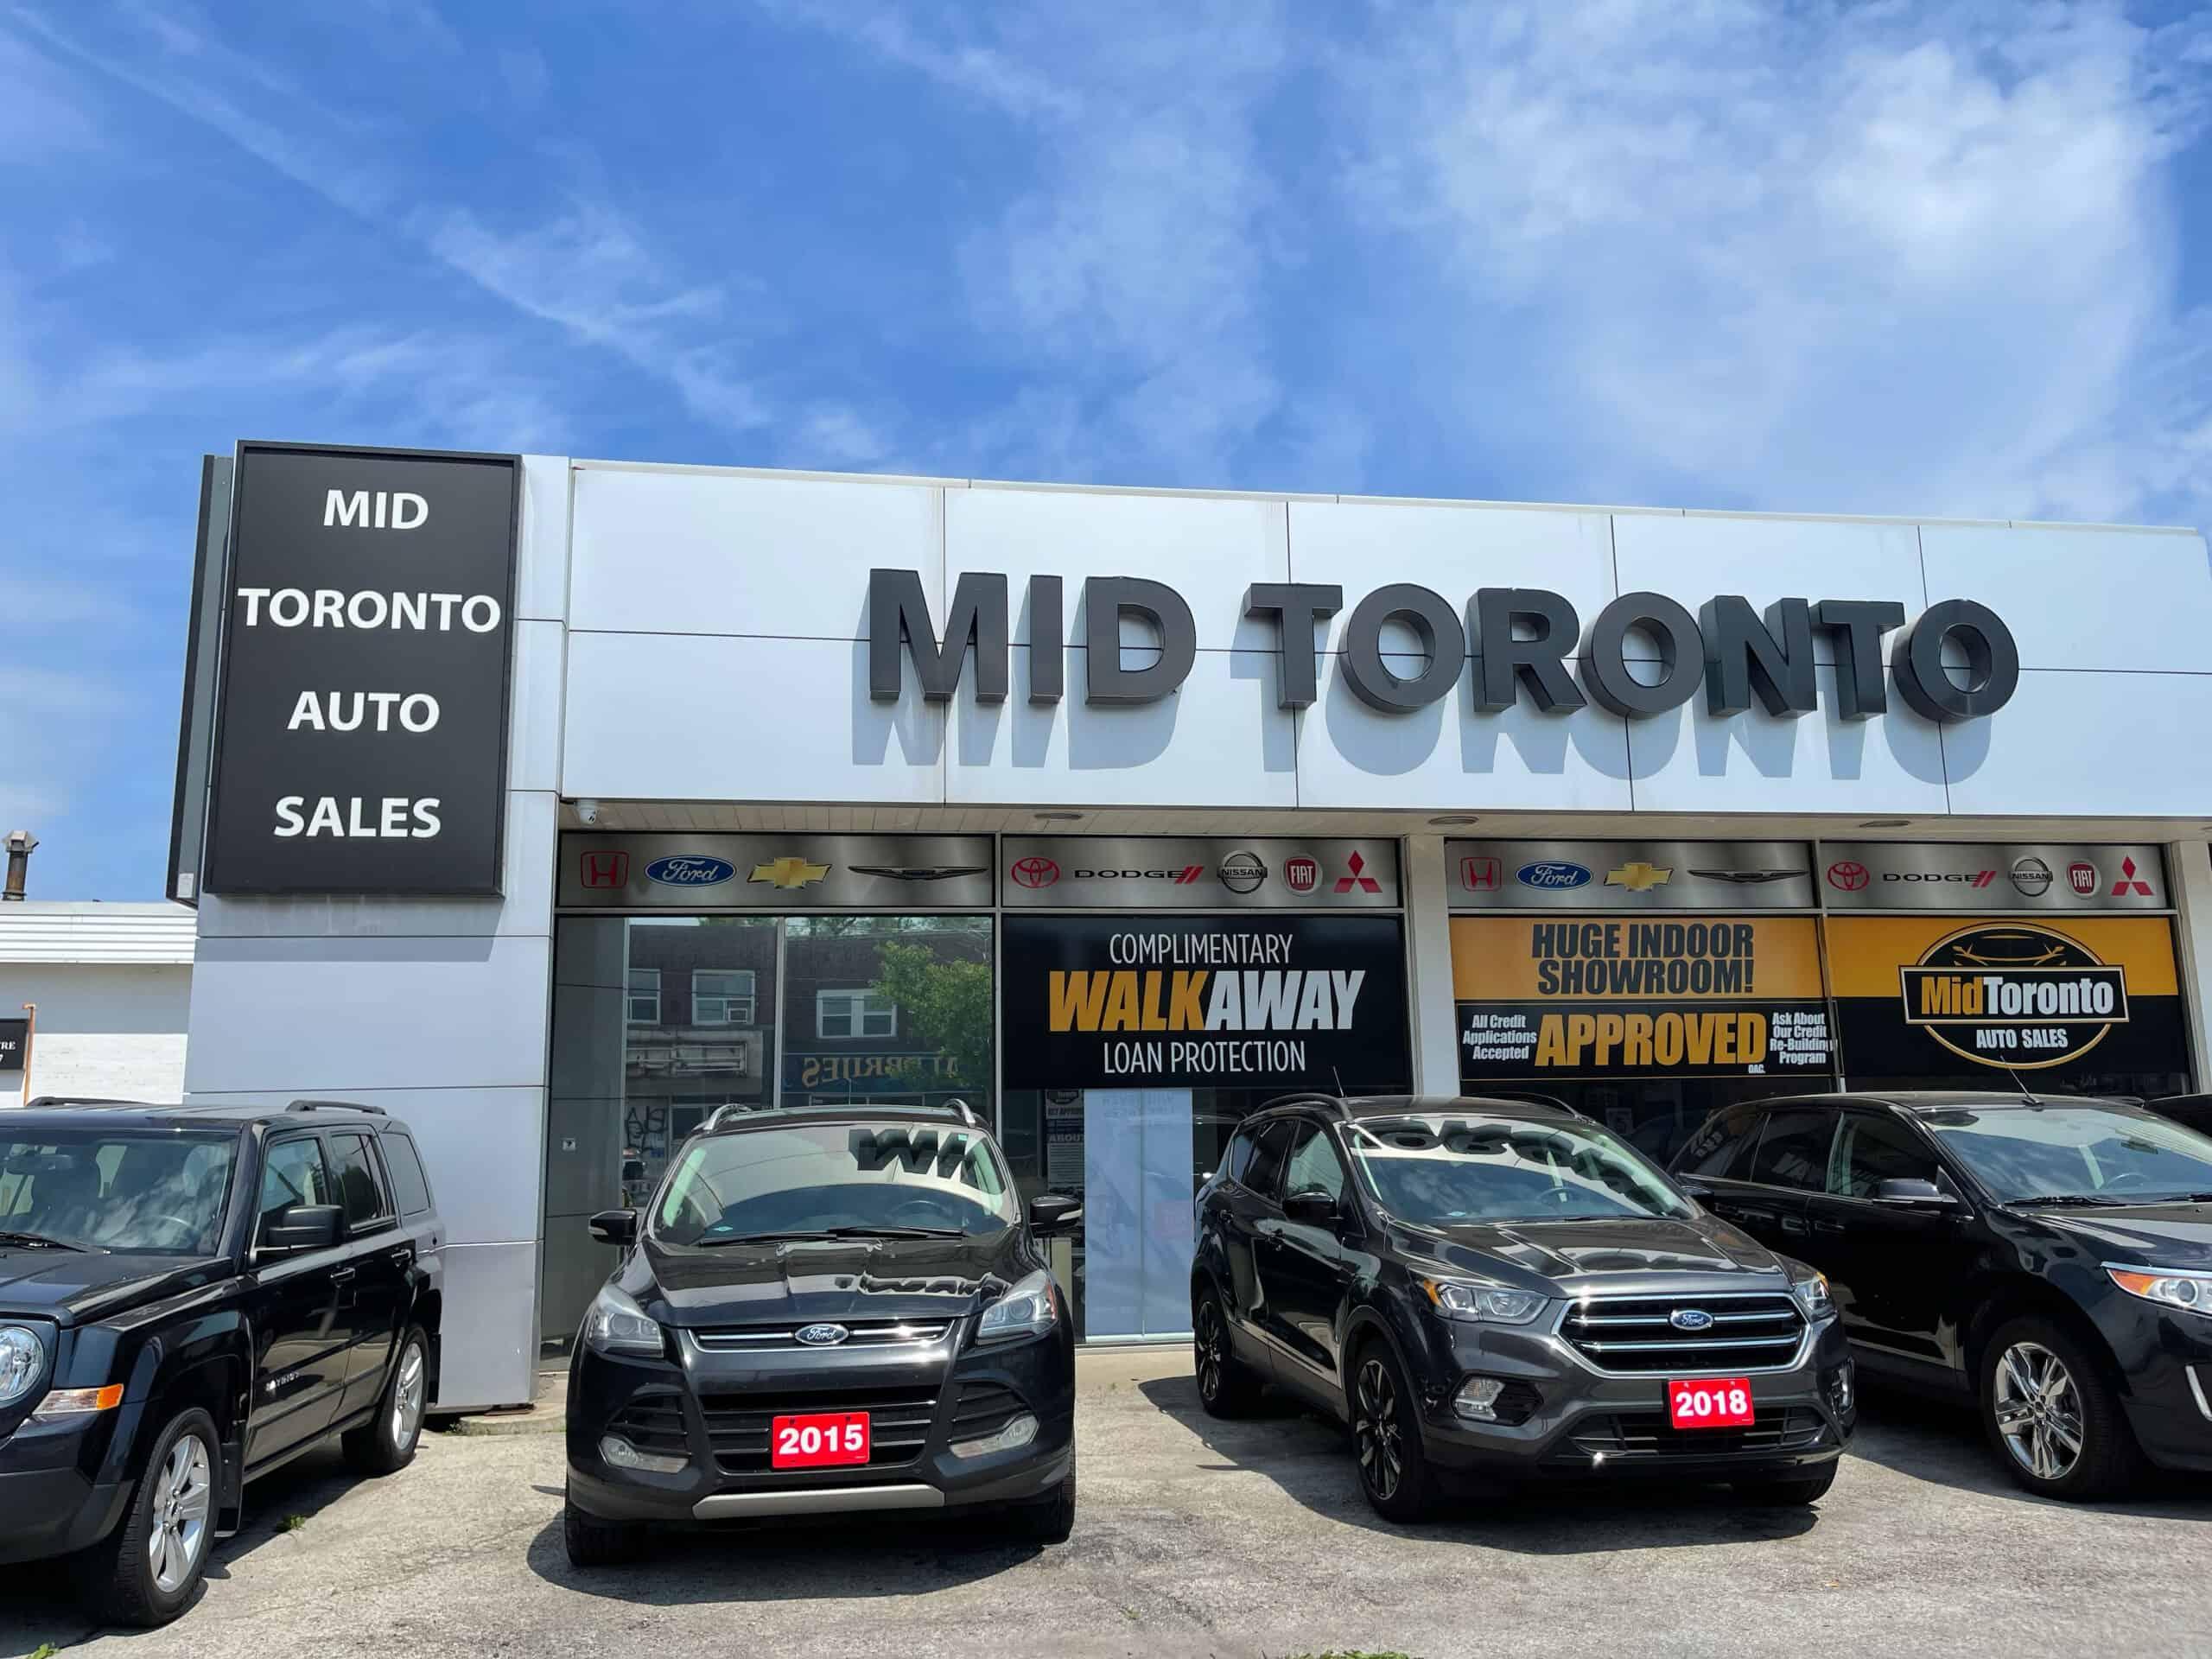 Mid-Toronto Auto Sales